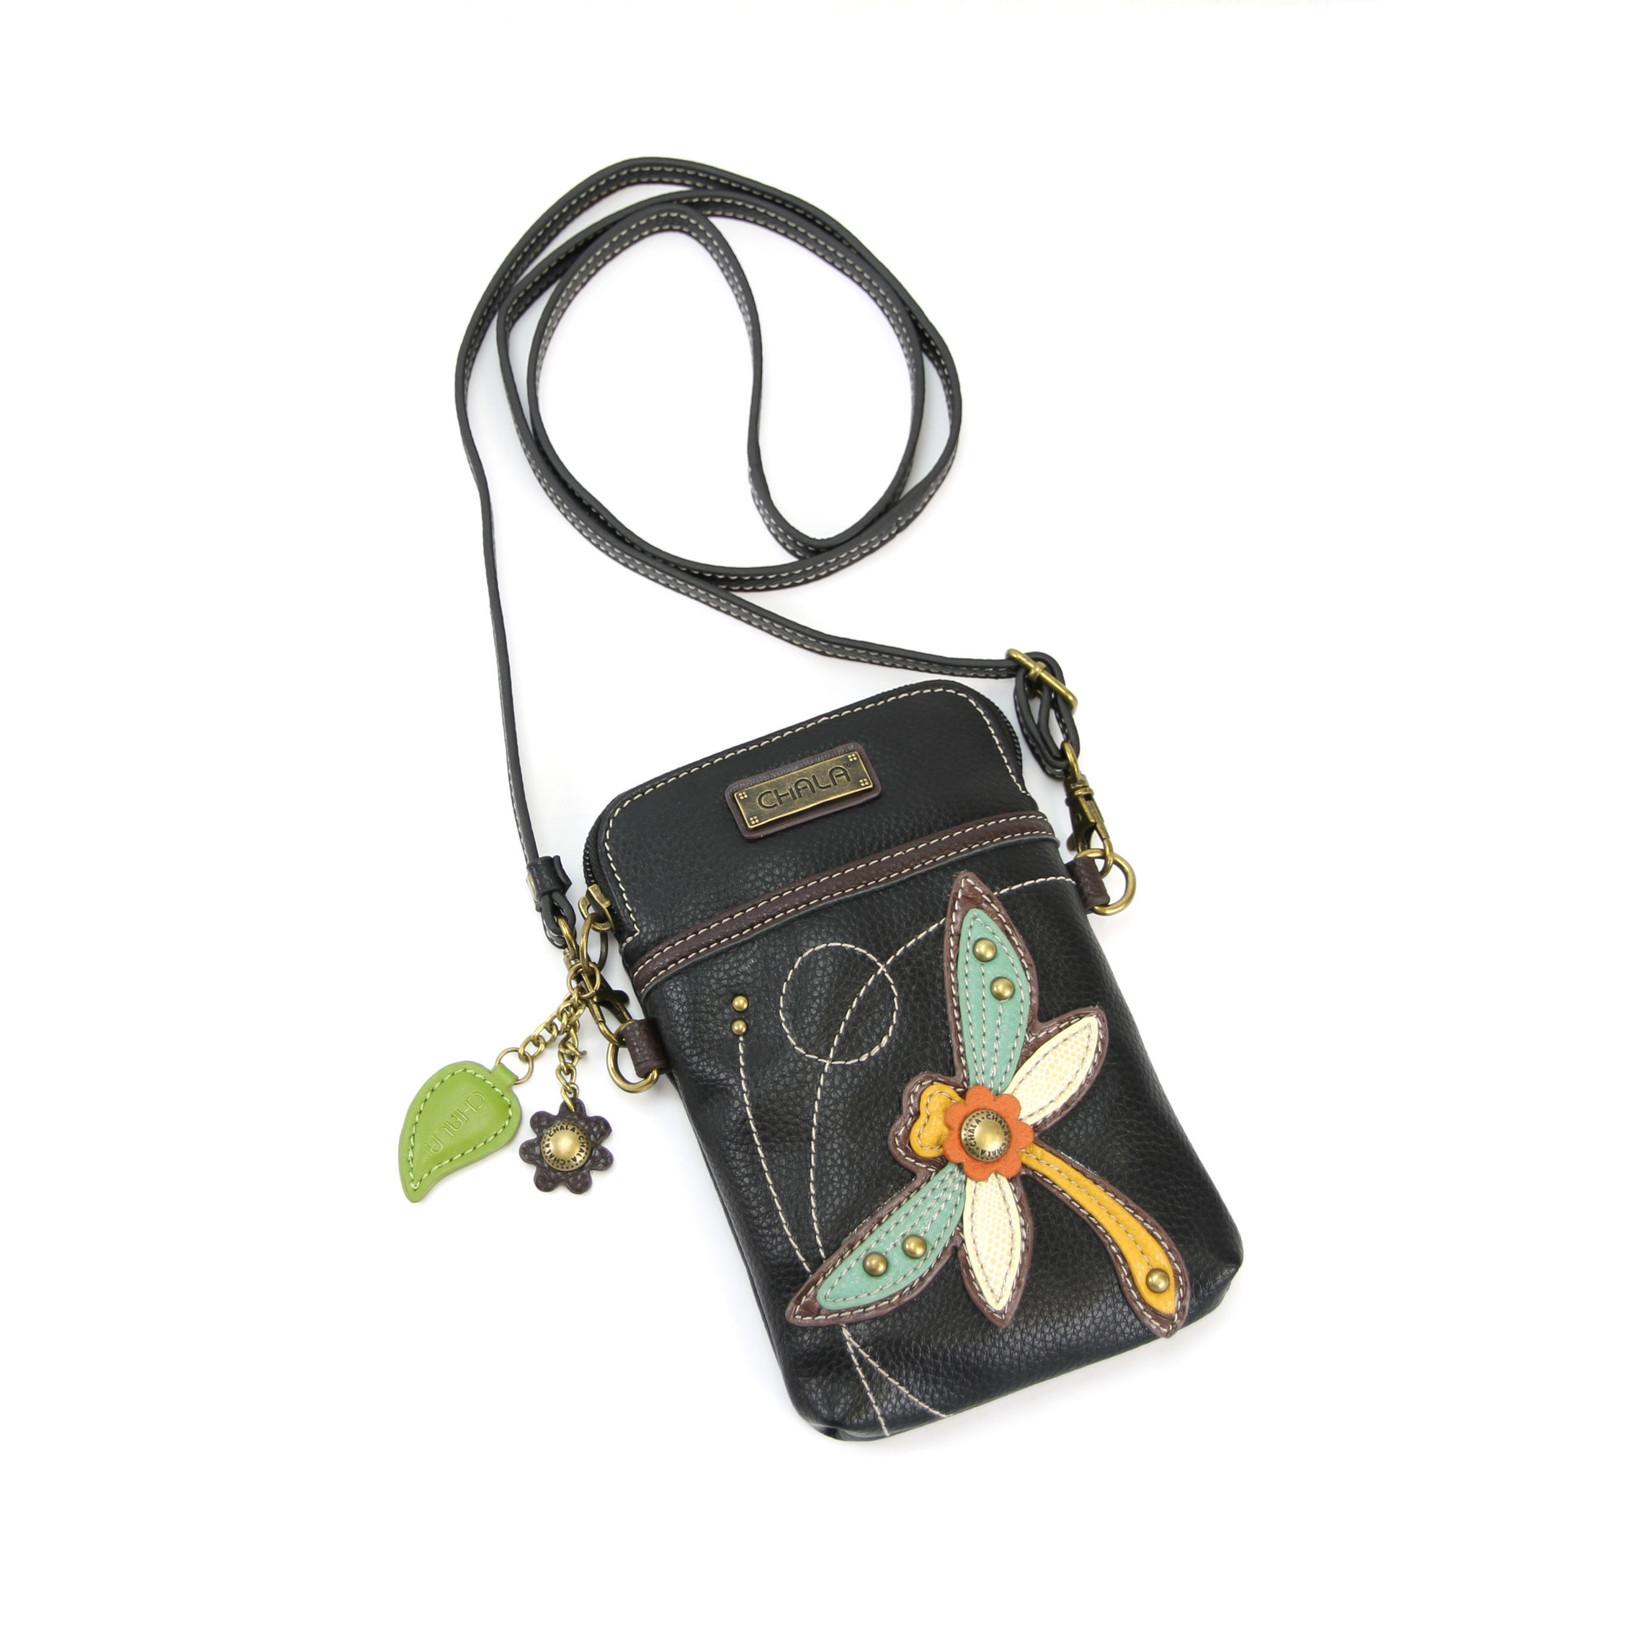 Chala Cell Phone Crossbody Dragonfly Black